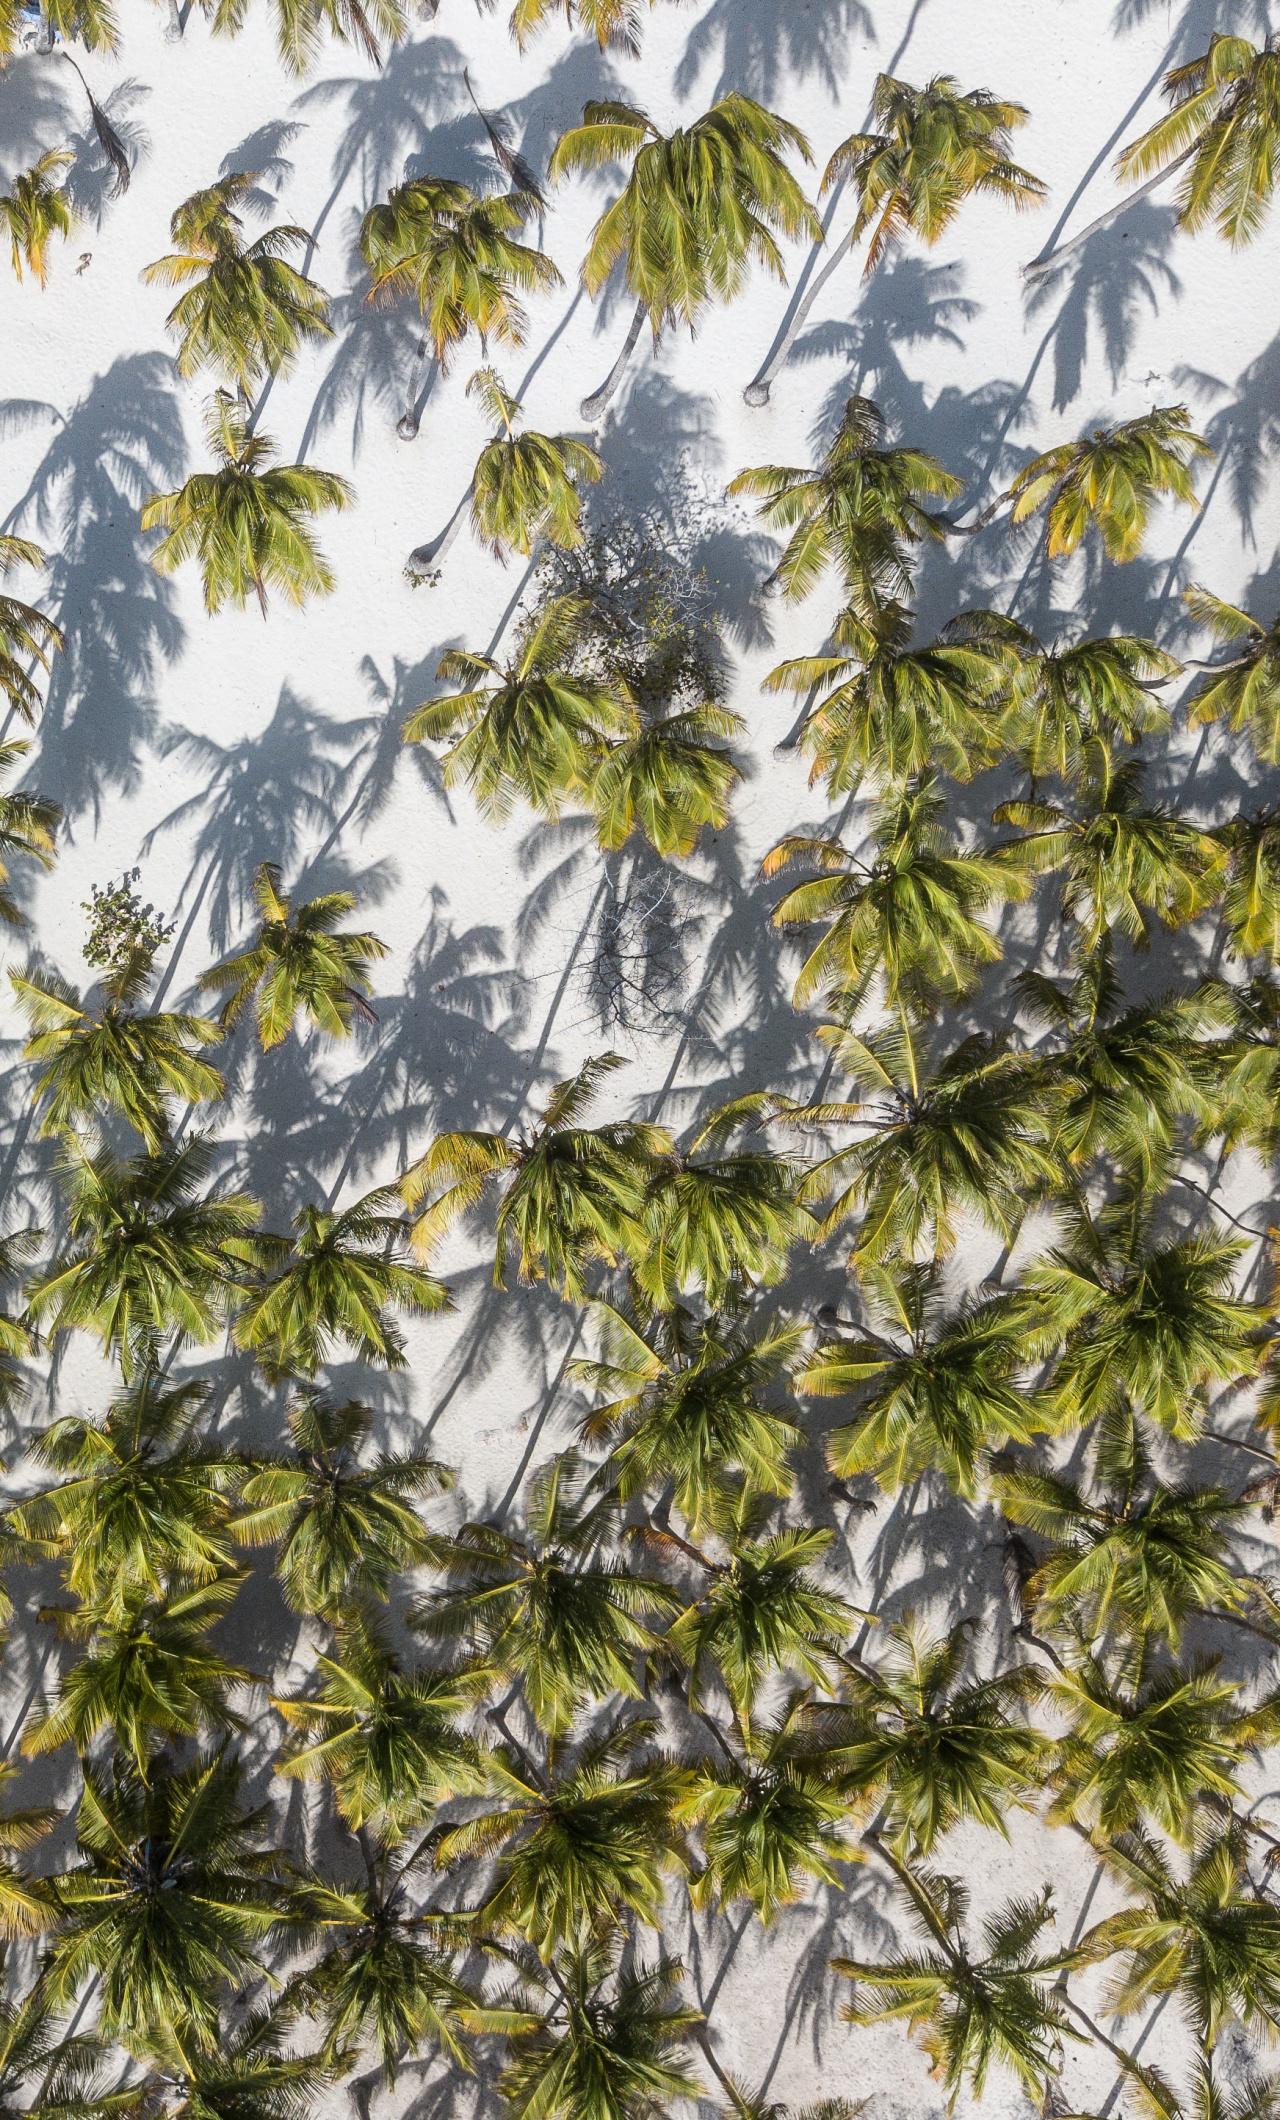 Iphone 7 Plus Wallpaper Palm Tree - HD Wallpaper